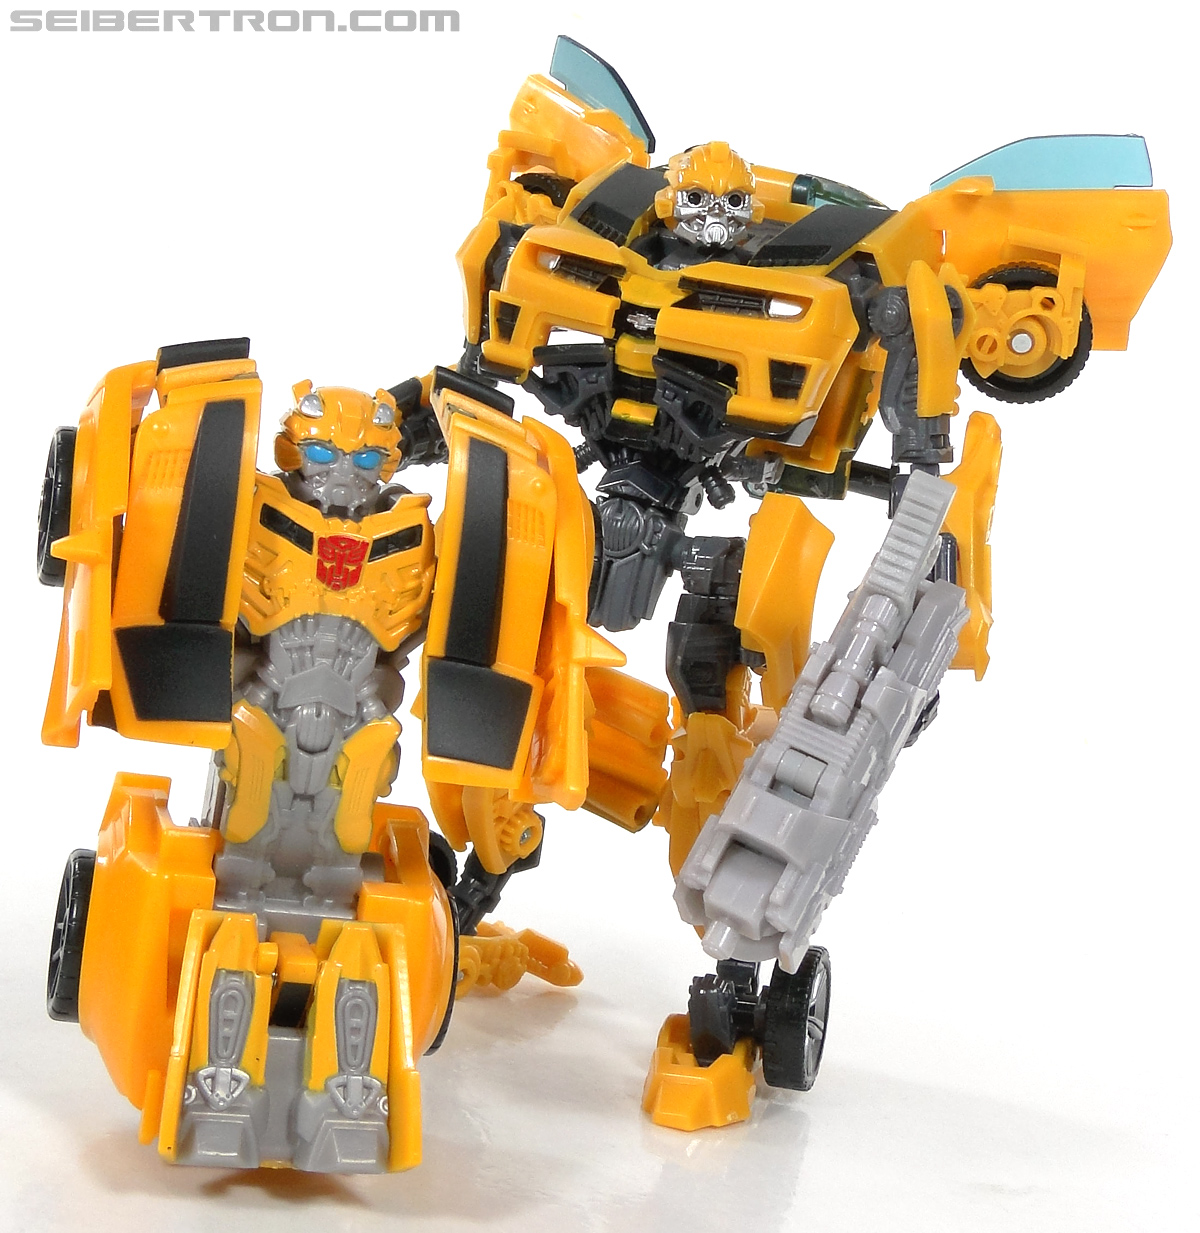 Transformers Dark of the Moon Bumblebee (Image #65 of 67)